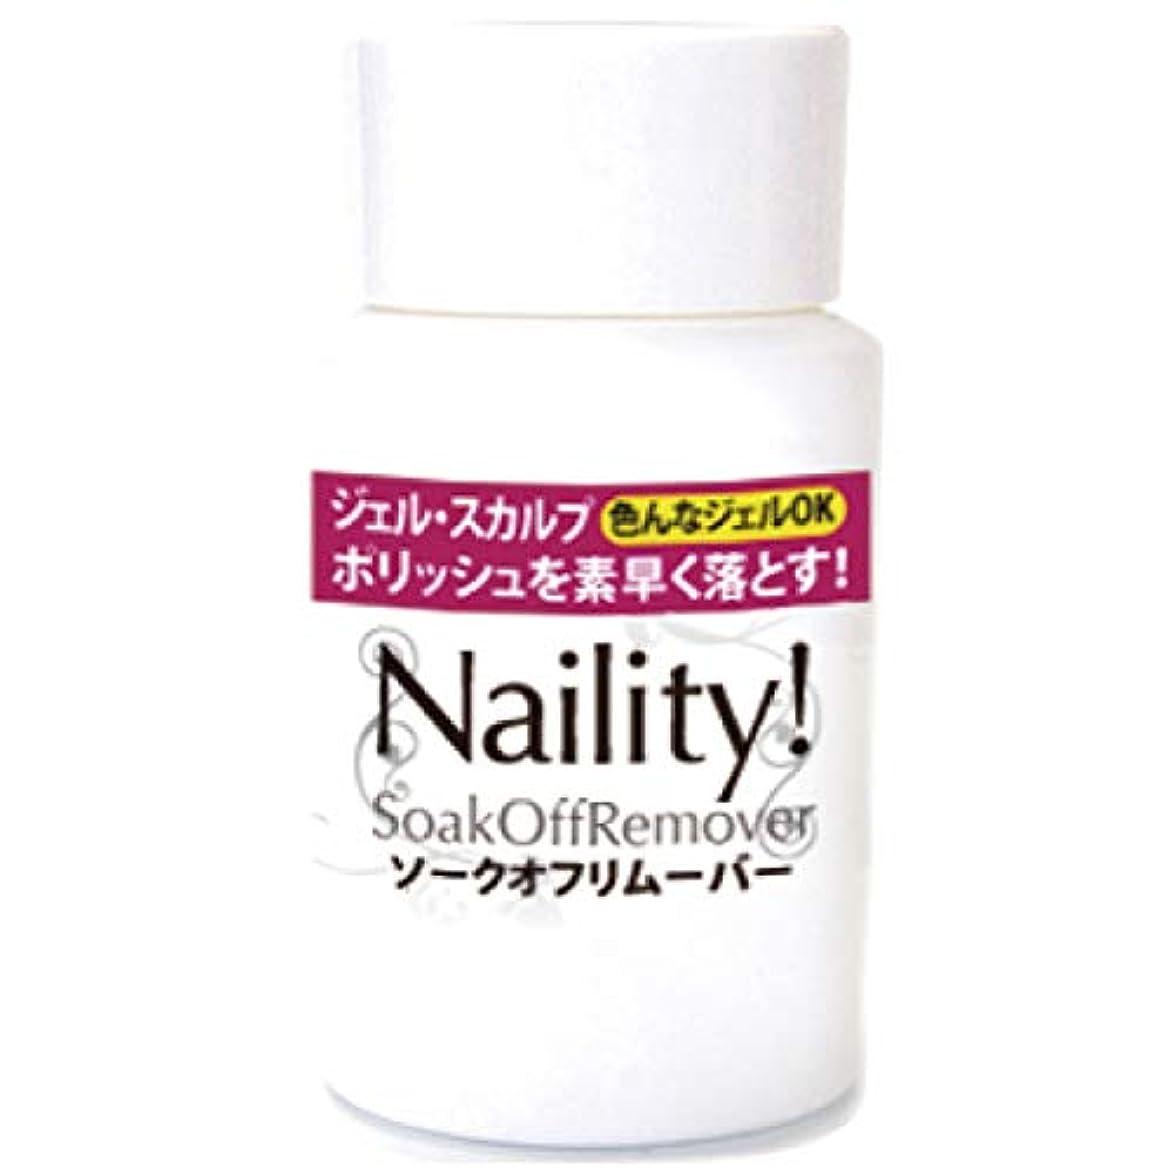 Naility! ソークオフリムーバー (リフィル) 500mL